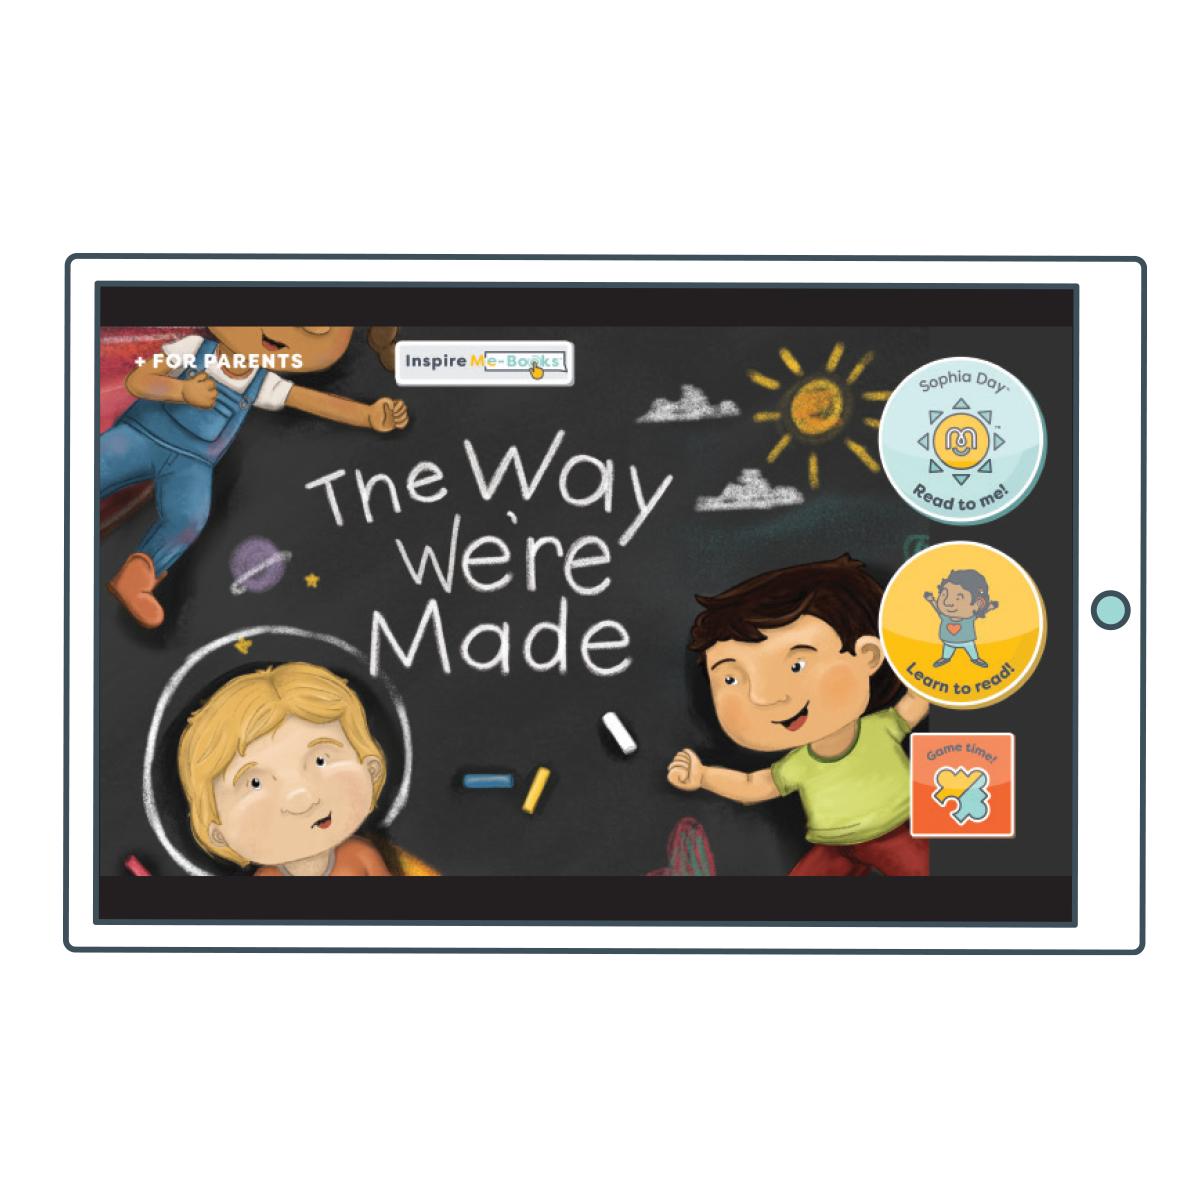 TheWayWereMade-InspireMe-Book.jpg